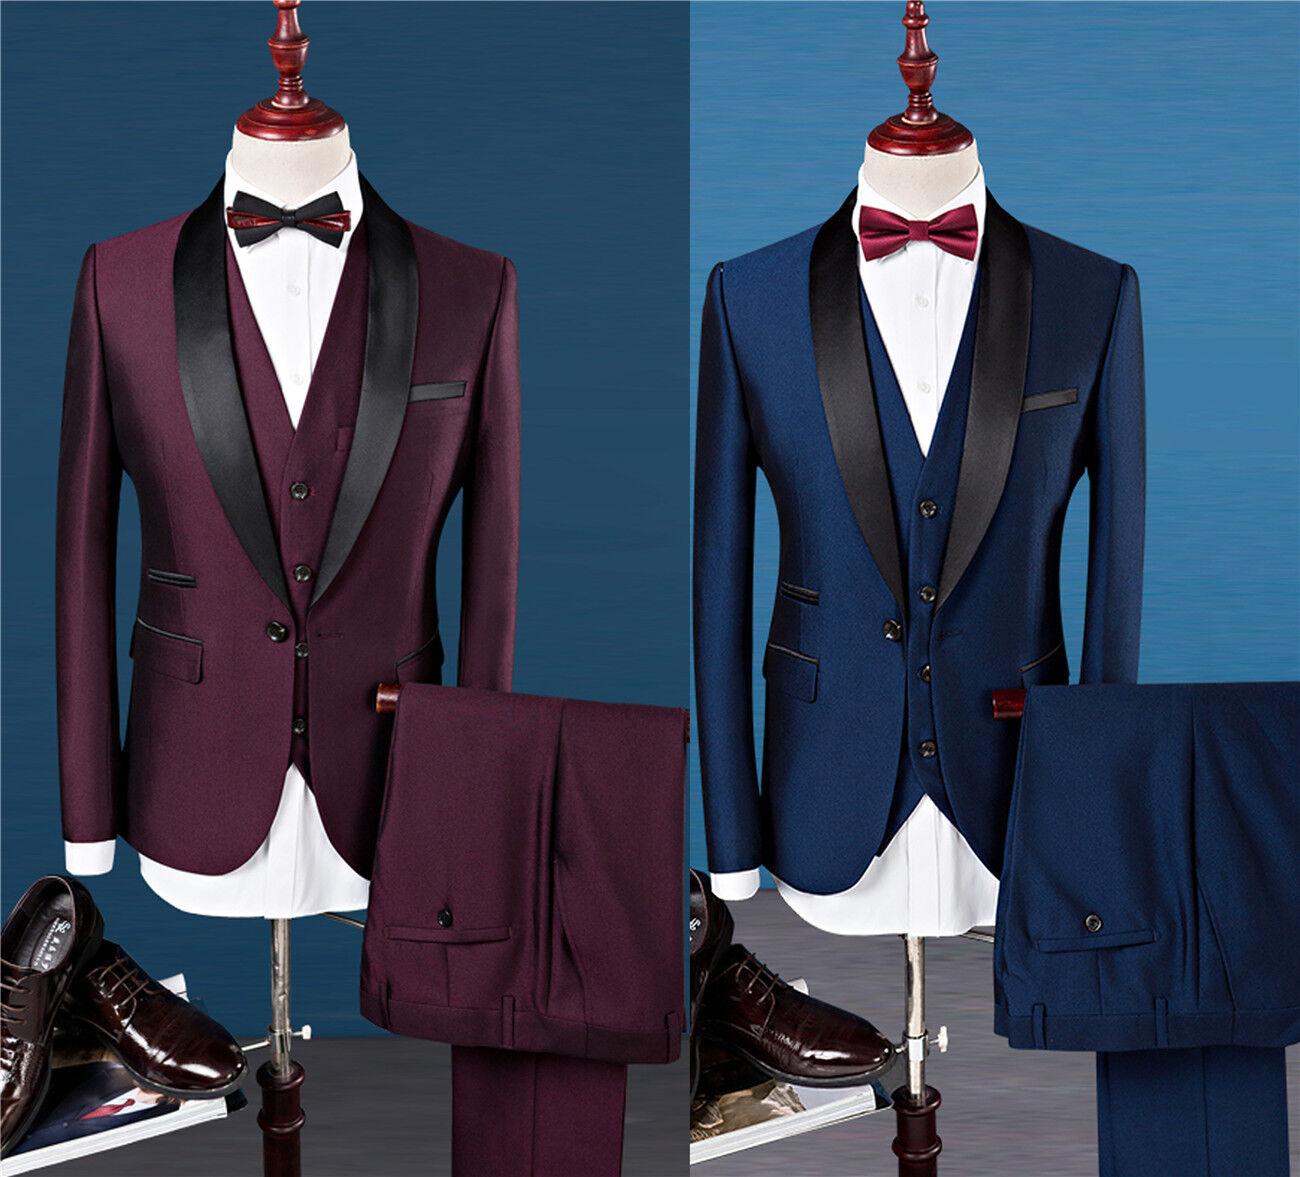 78e1d4210ae43 Burgundy Wedding Groom Best Man Formal Prom Suits Men Tuxedo Suit ...